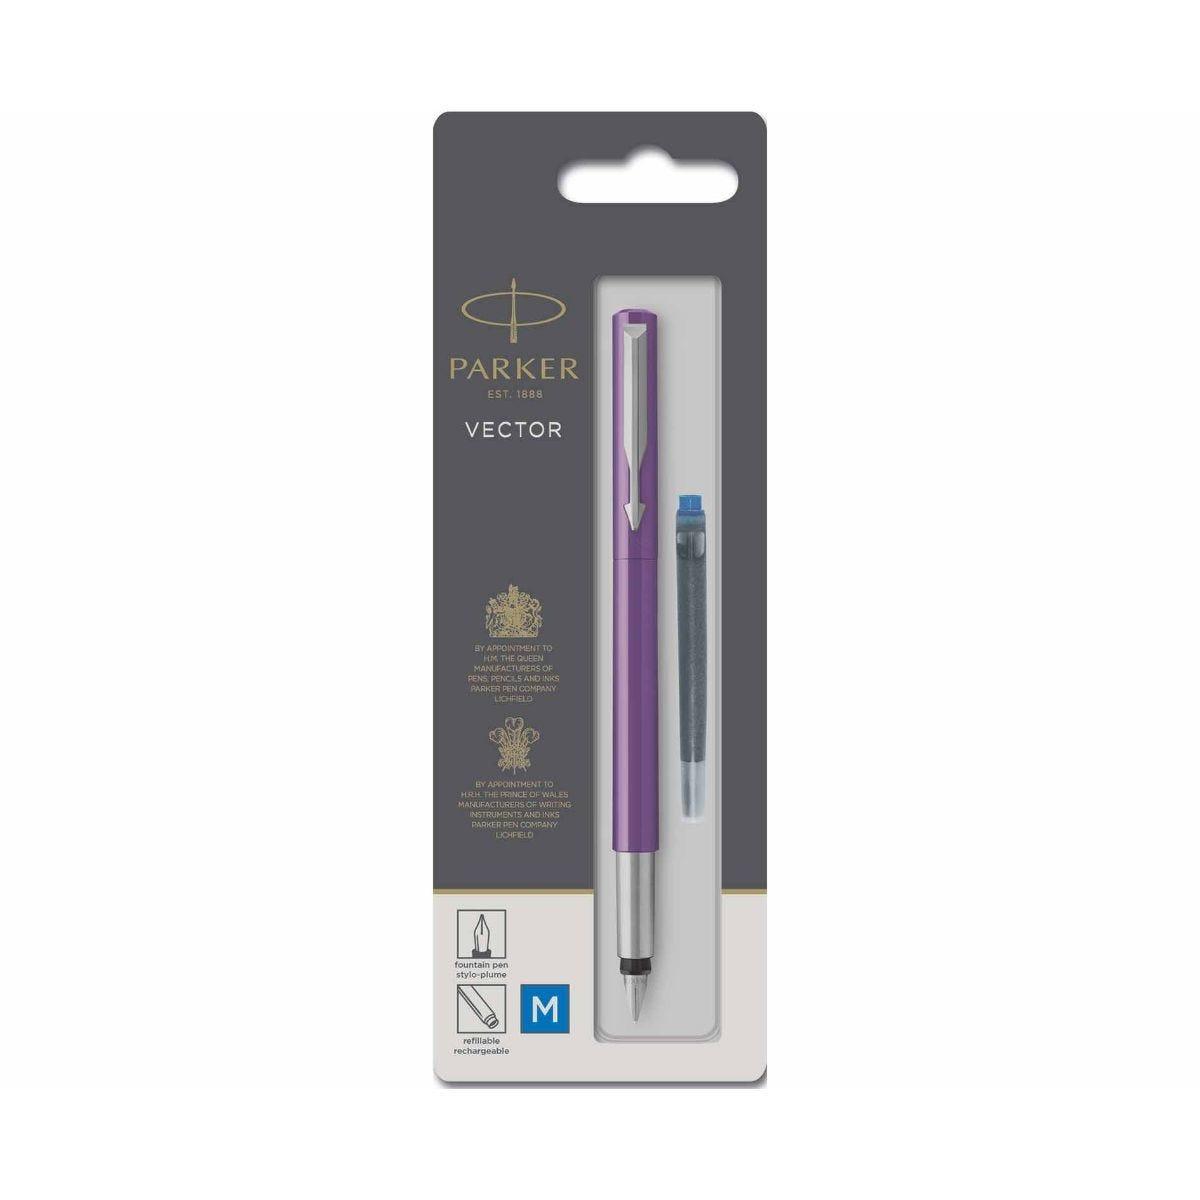 Parker Vector Fountain Pen Medium Purple